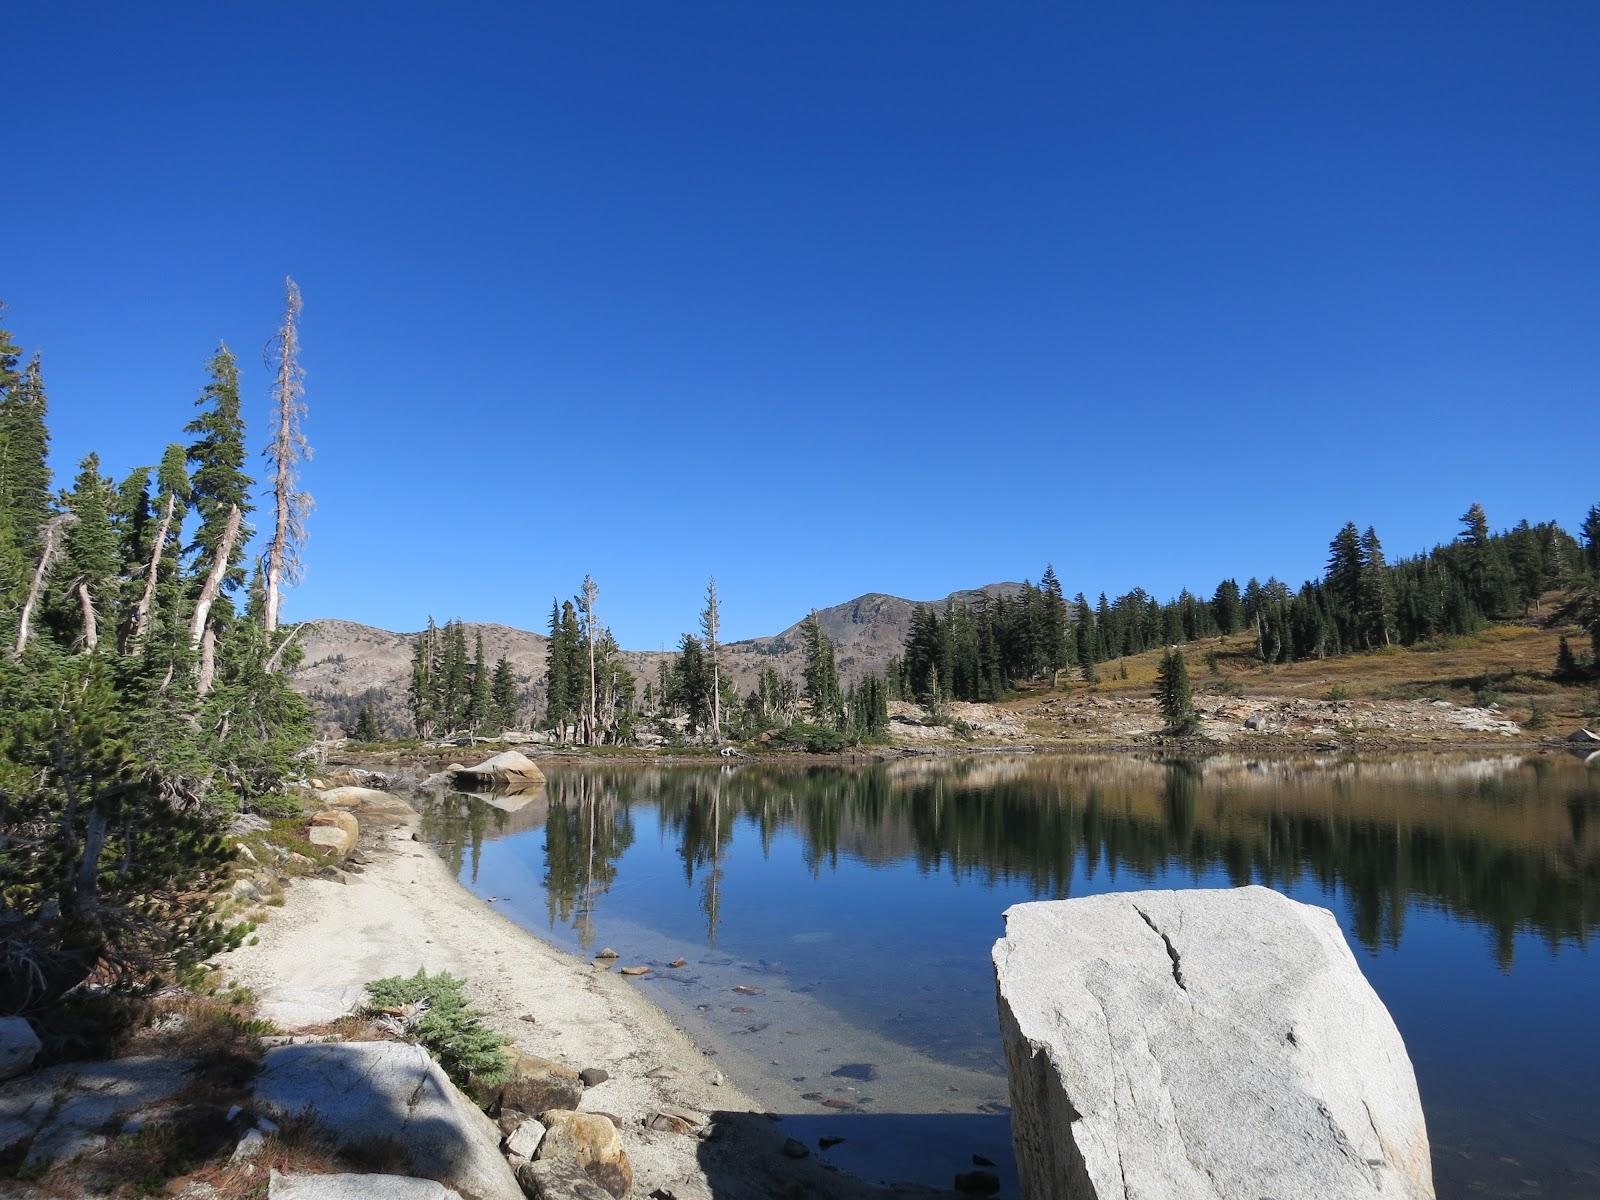 Doris Lake, Desolation Wilderness